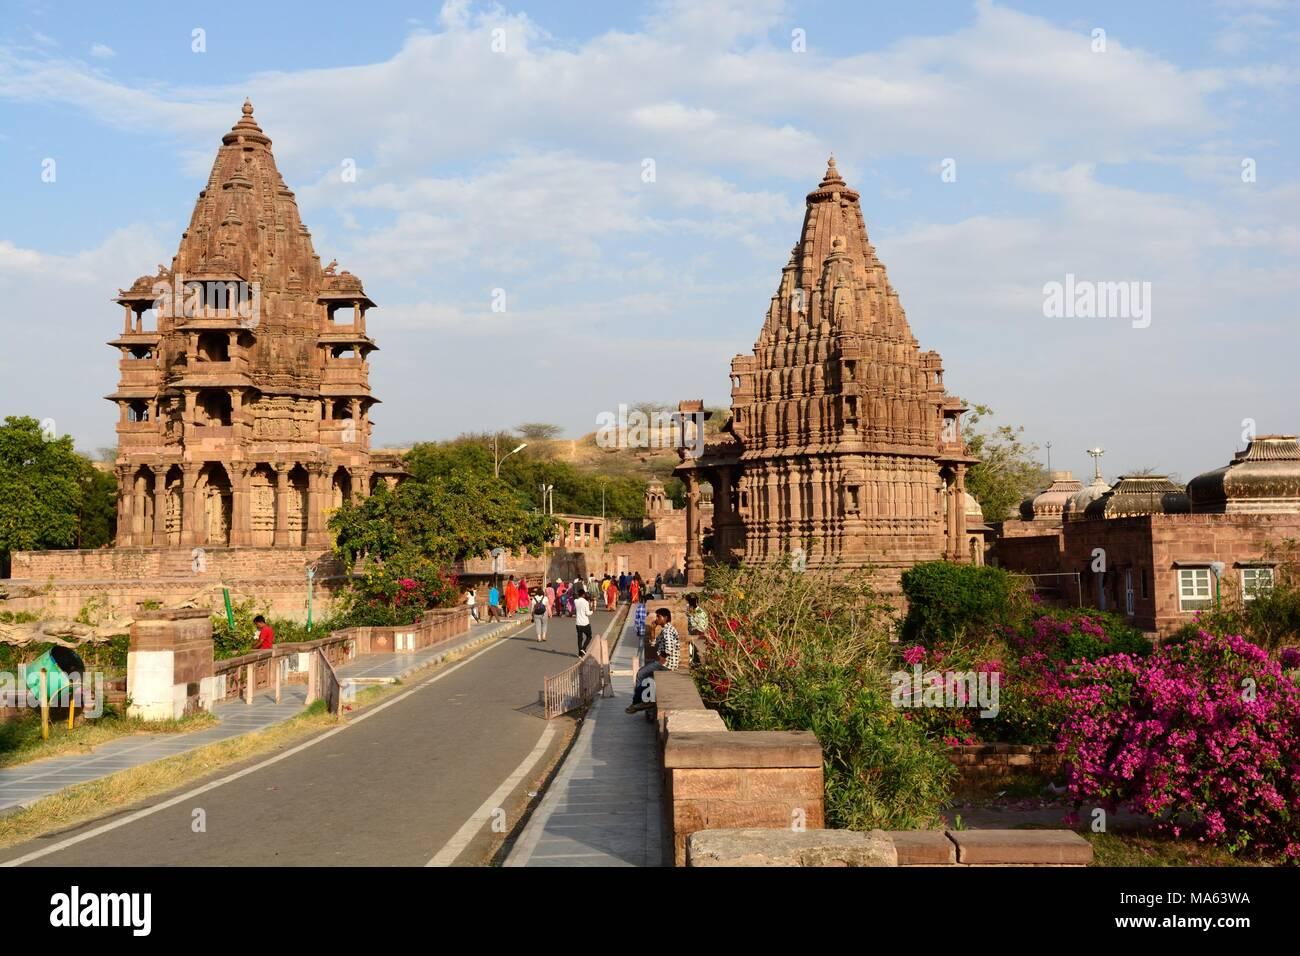 Mandore Gardens Temples and cenotaphs Jodhpur Rajashan india - Stock Image